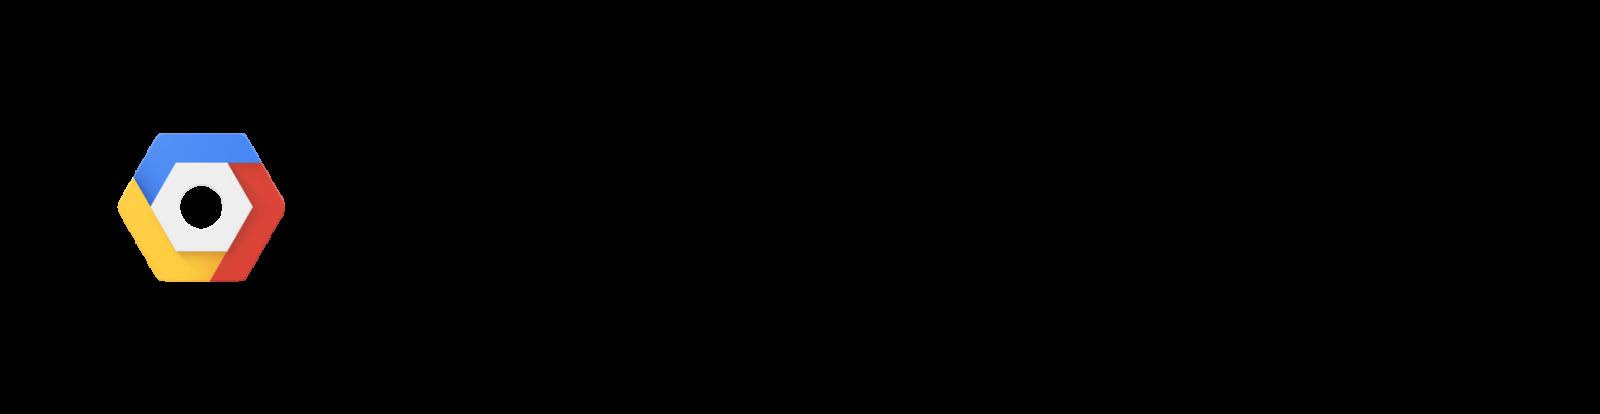 1458139257981